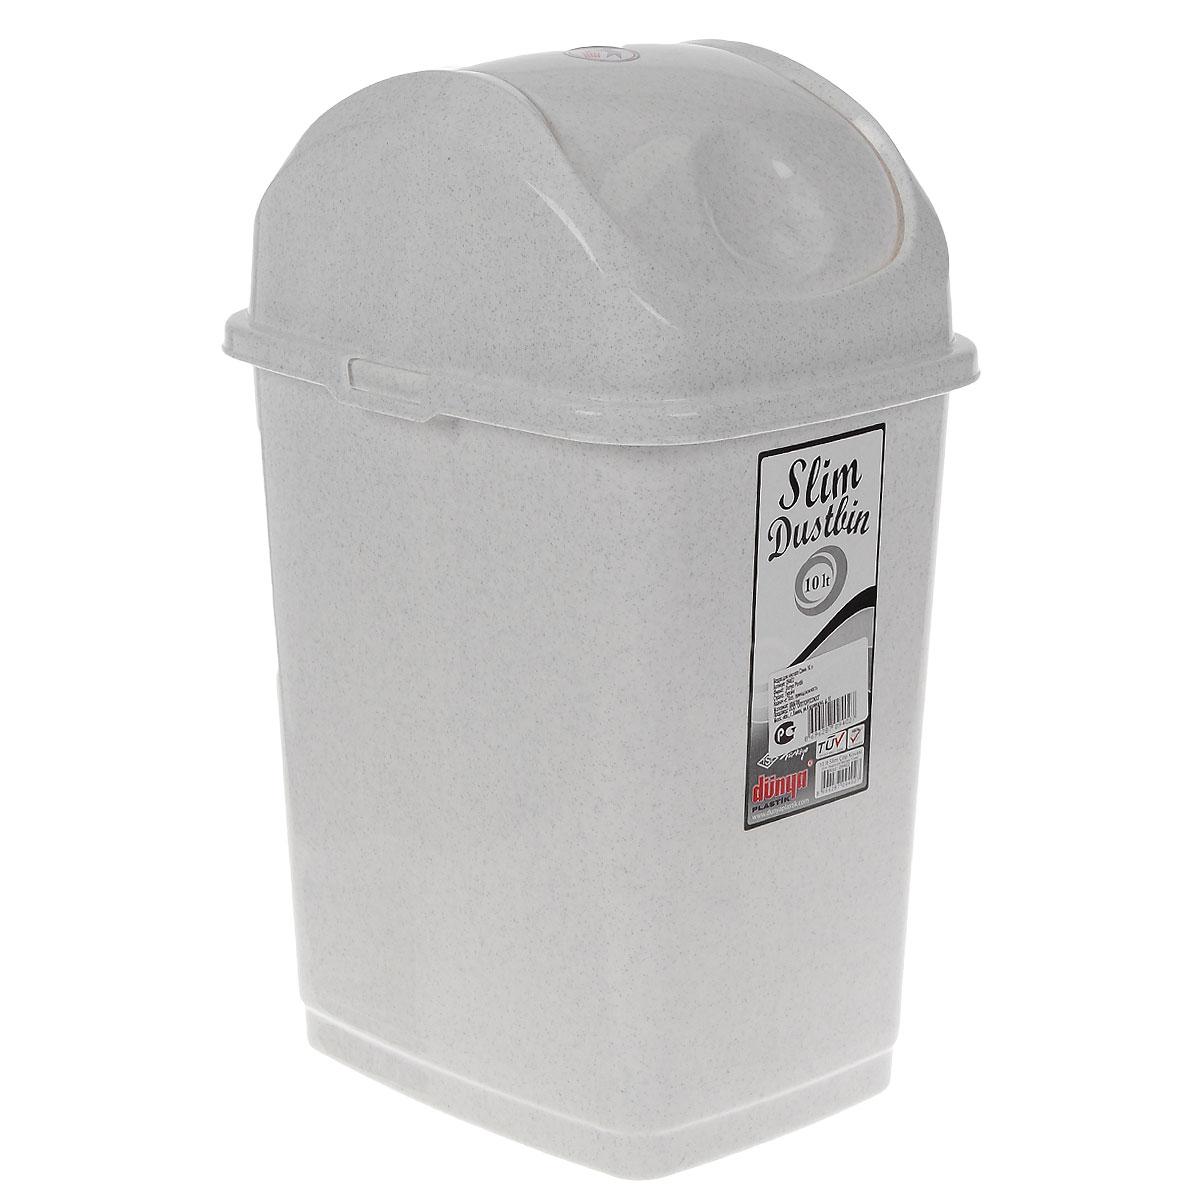 ����� ��� ������ Dunya Plastik ����, ����: �����, 10 � - Dunya Plastik9402 ���������� ��� ������ Dunya Plastik ����������� �� �������� ��������. ������� �������� ����������� �������, ������� ��������� ������ ����������� ����� ��� �� ����������. ����� �������� ����� ��������� �������� ��� �������, ������, �����. ������������ ������ �������� ��� ����� �������� ���������.